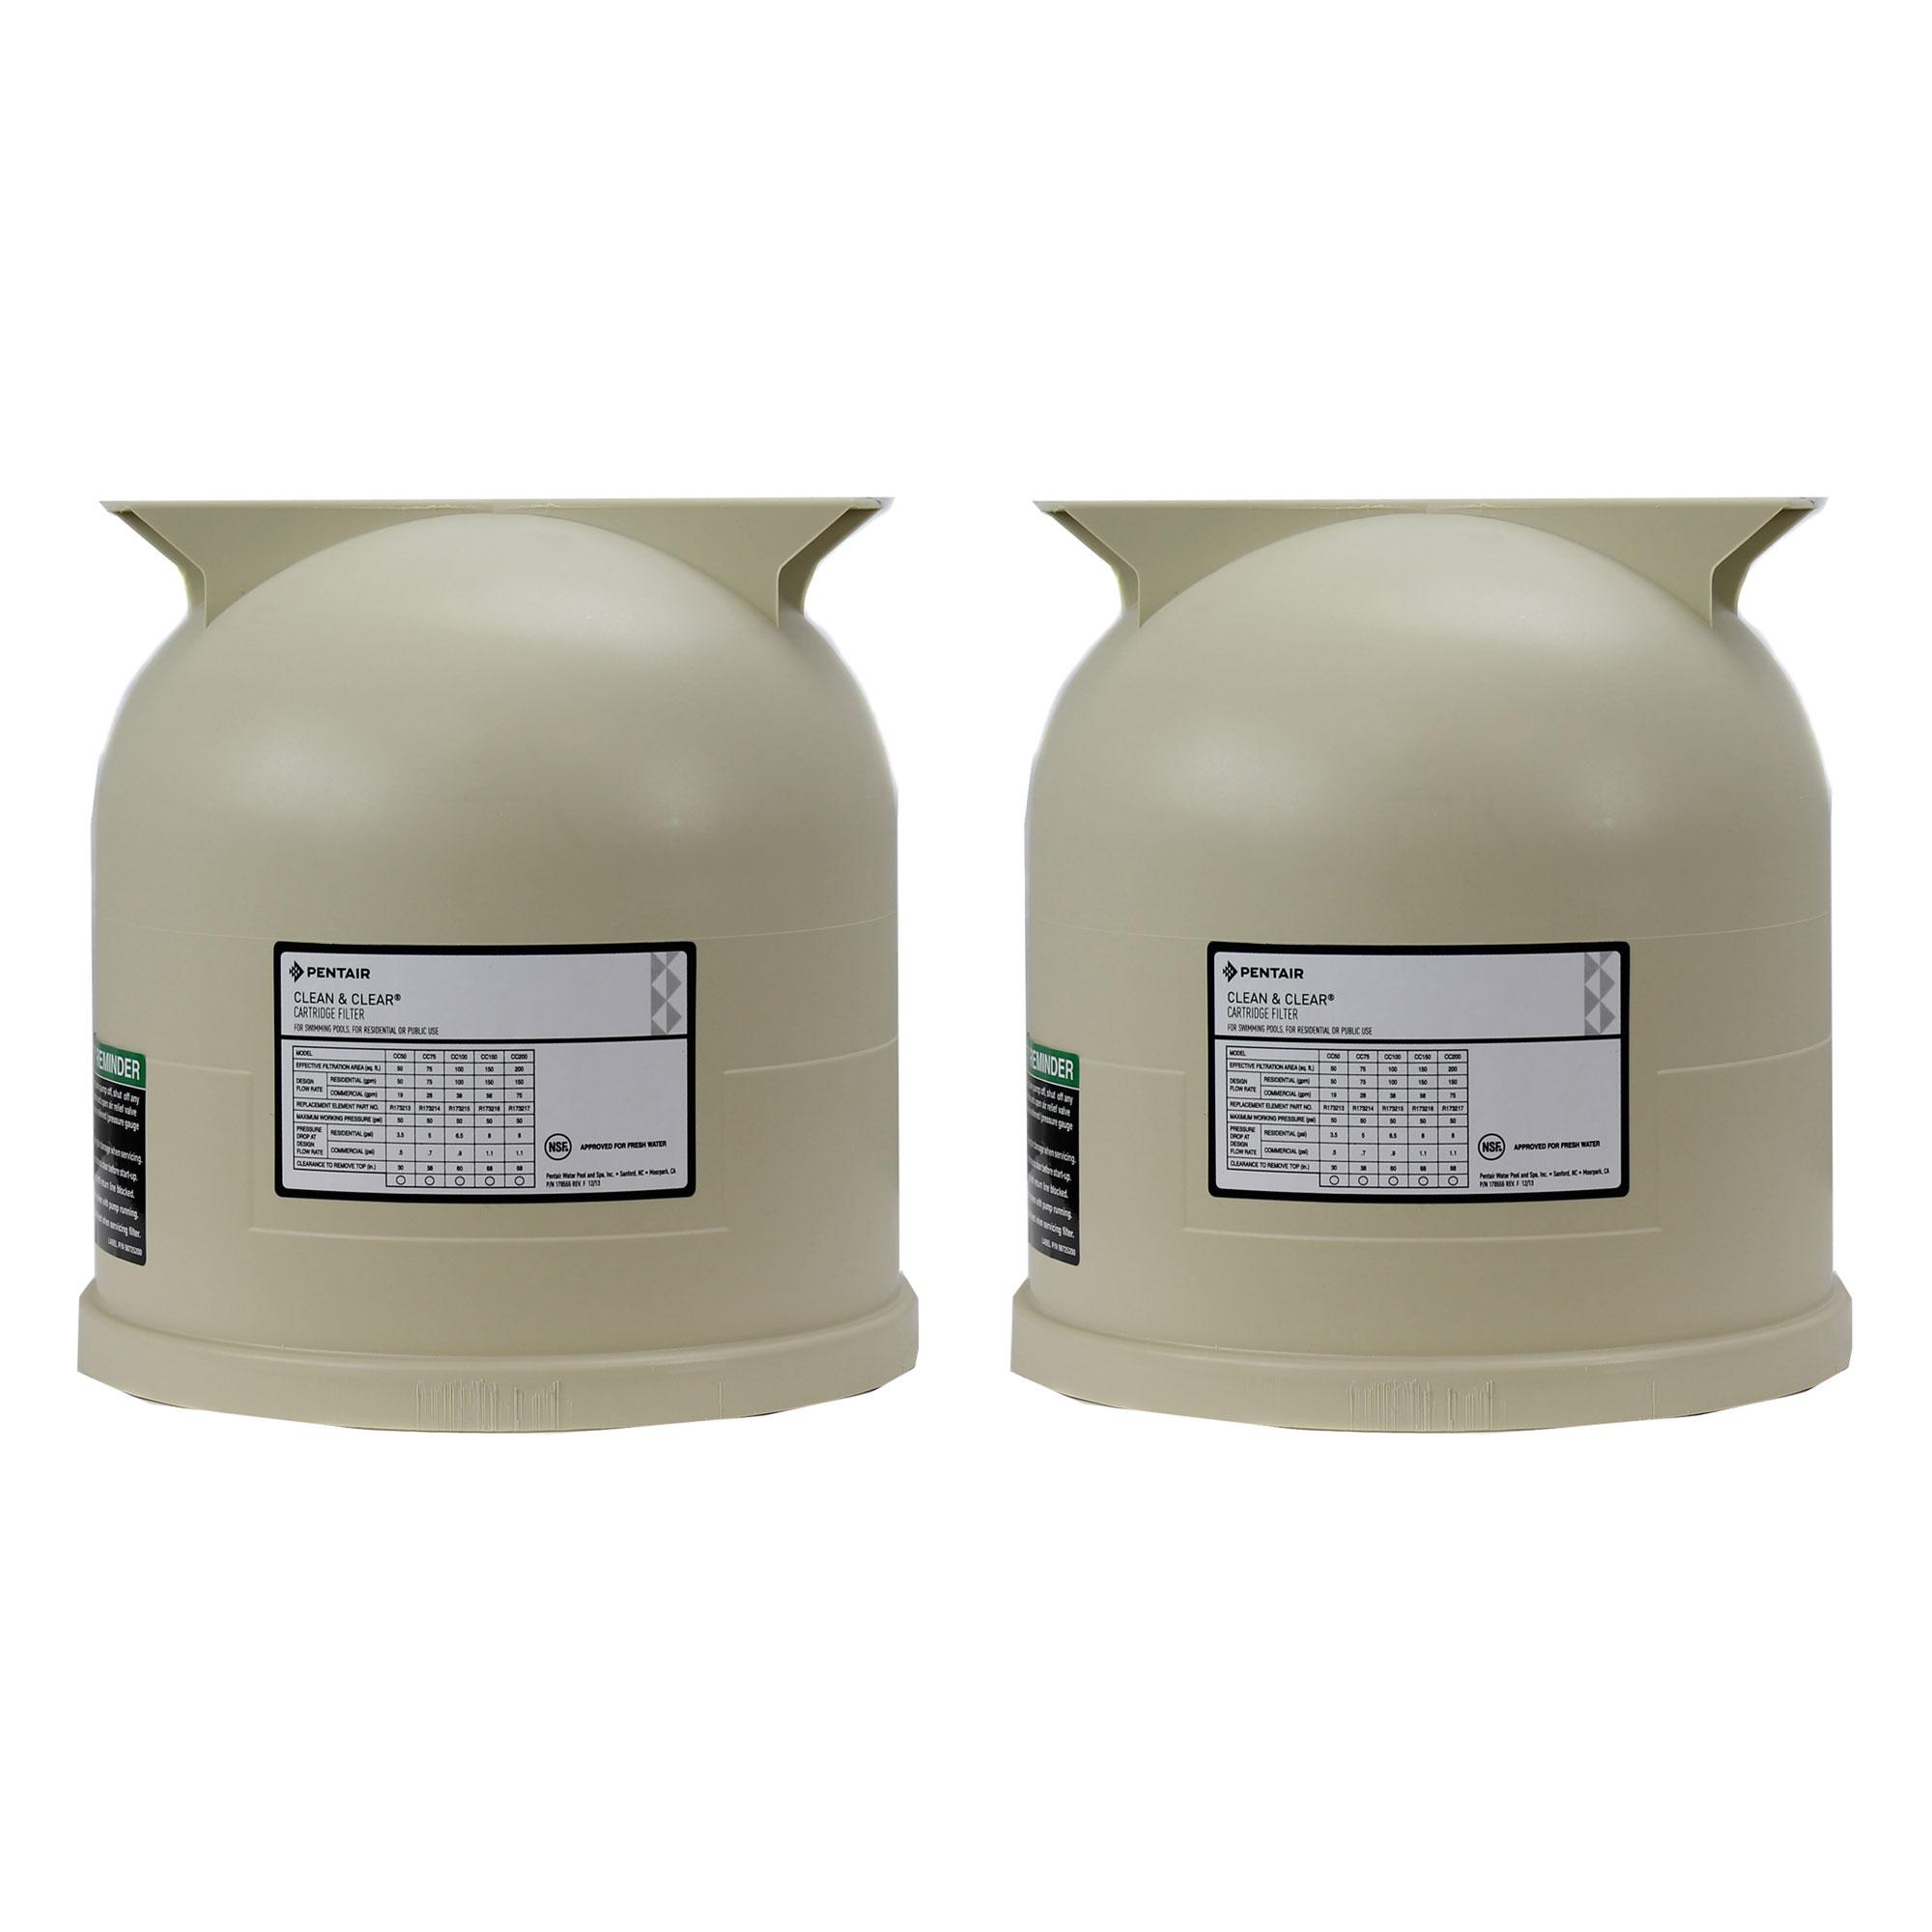 Details about Pentair 178561 Clean Clear Predator Swimming Pool Cartridge  Filter Lid (2 Pack)